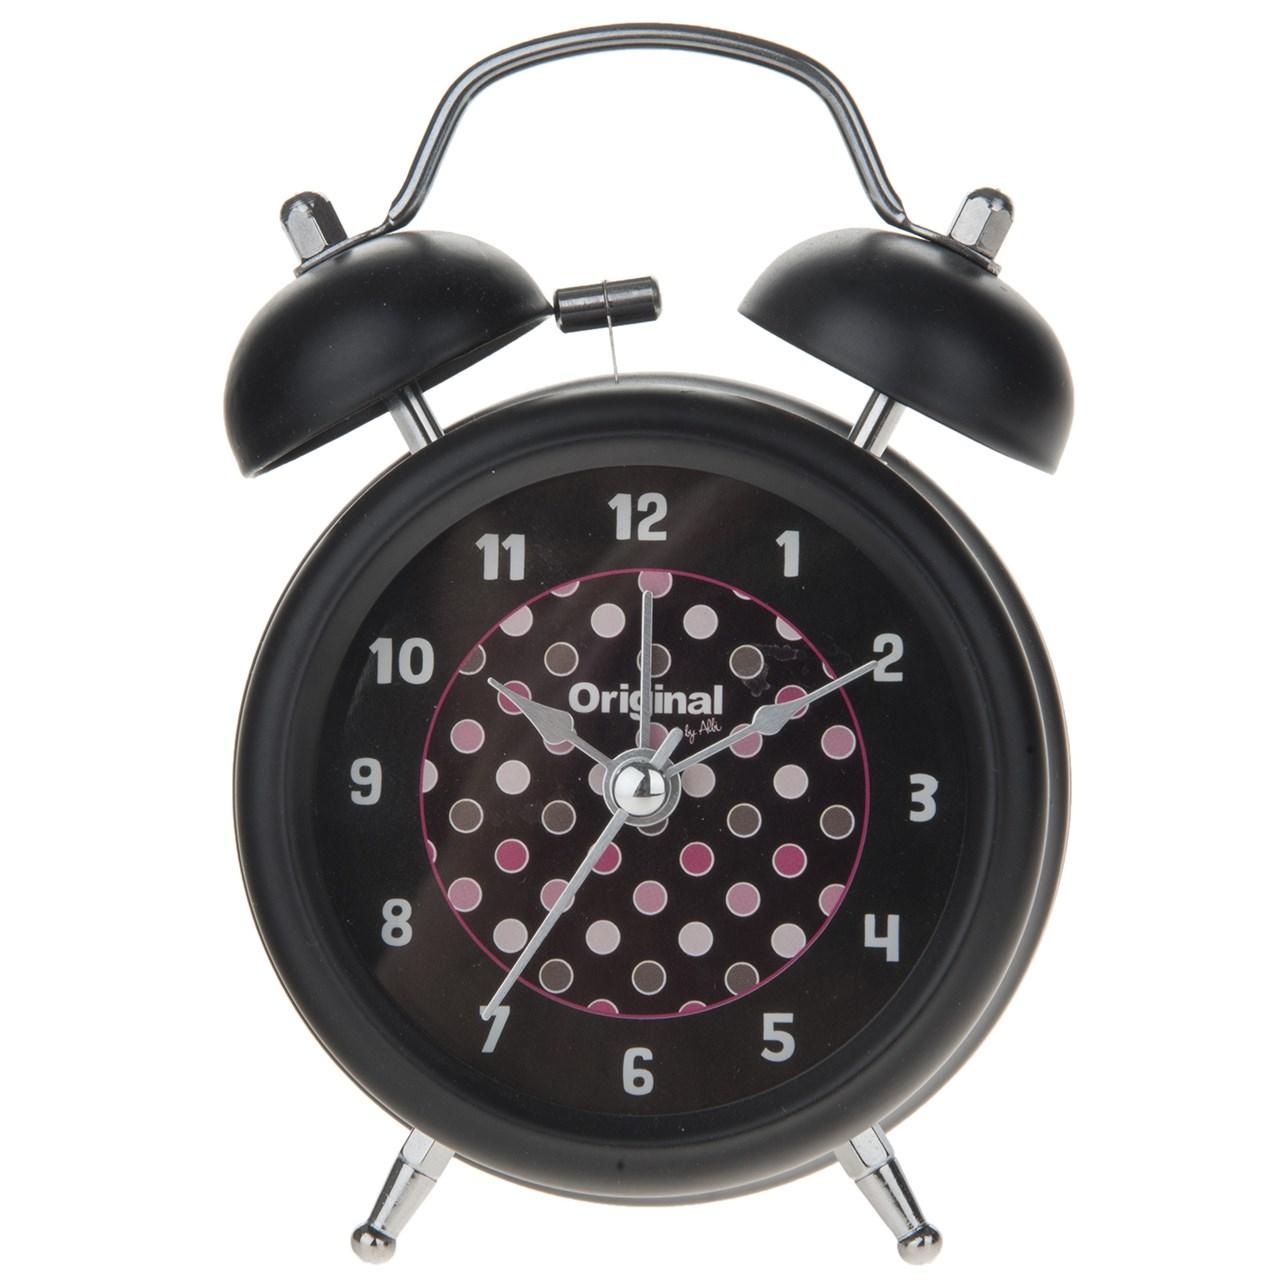 ساعت رومیزی تایتل کد 10